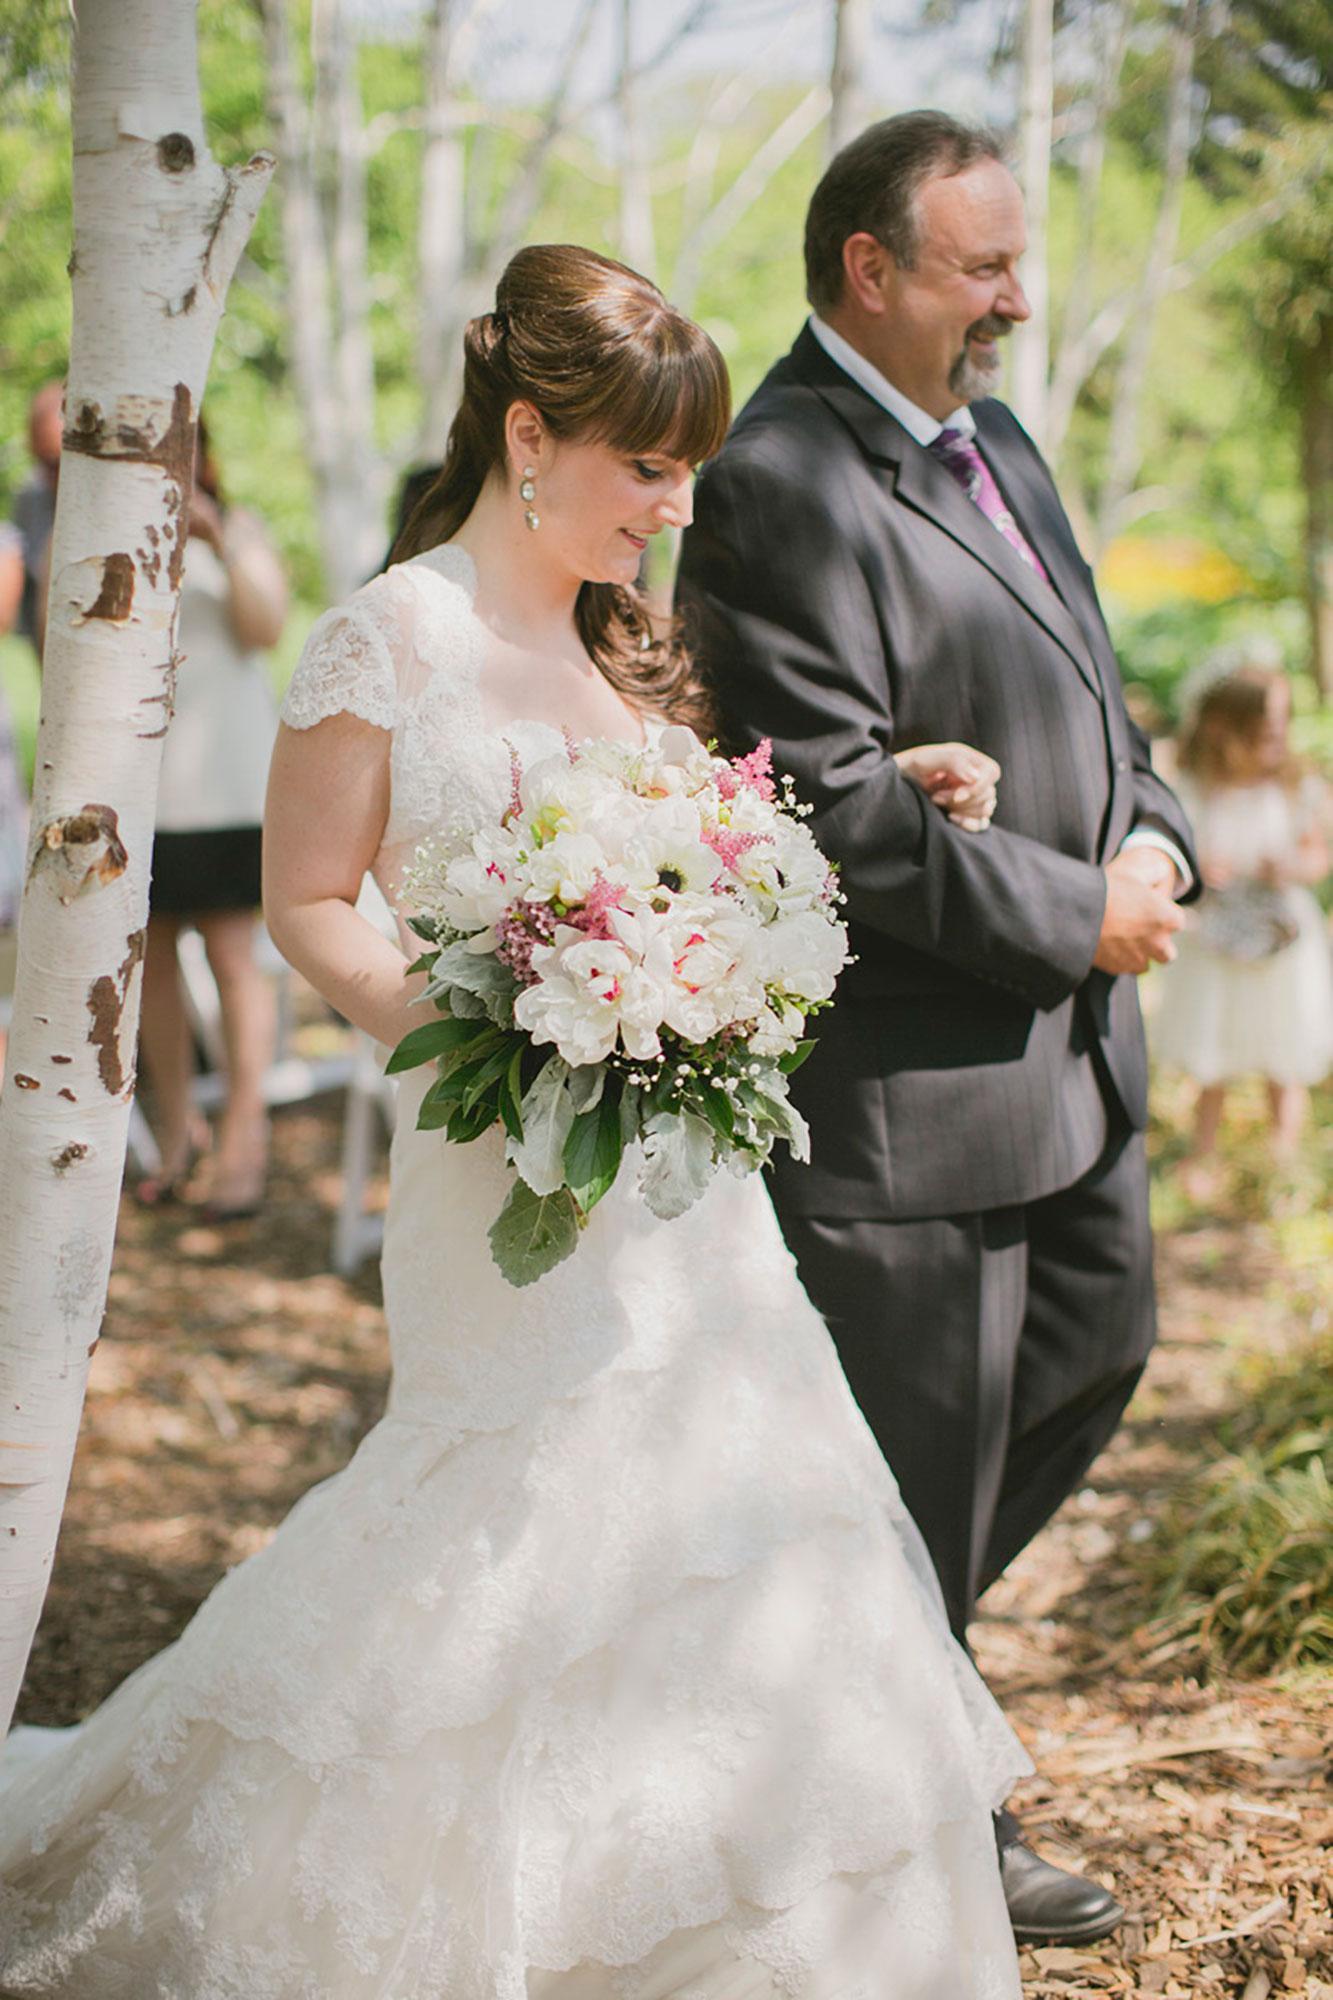 Balls-Falls-Vineyard-Bride-Photo-By-Elizabeth-in-Love-012.jpg